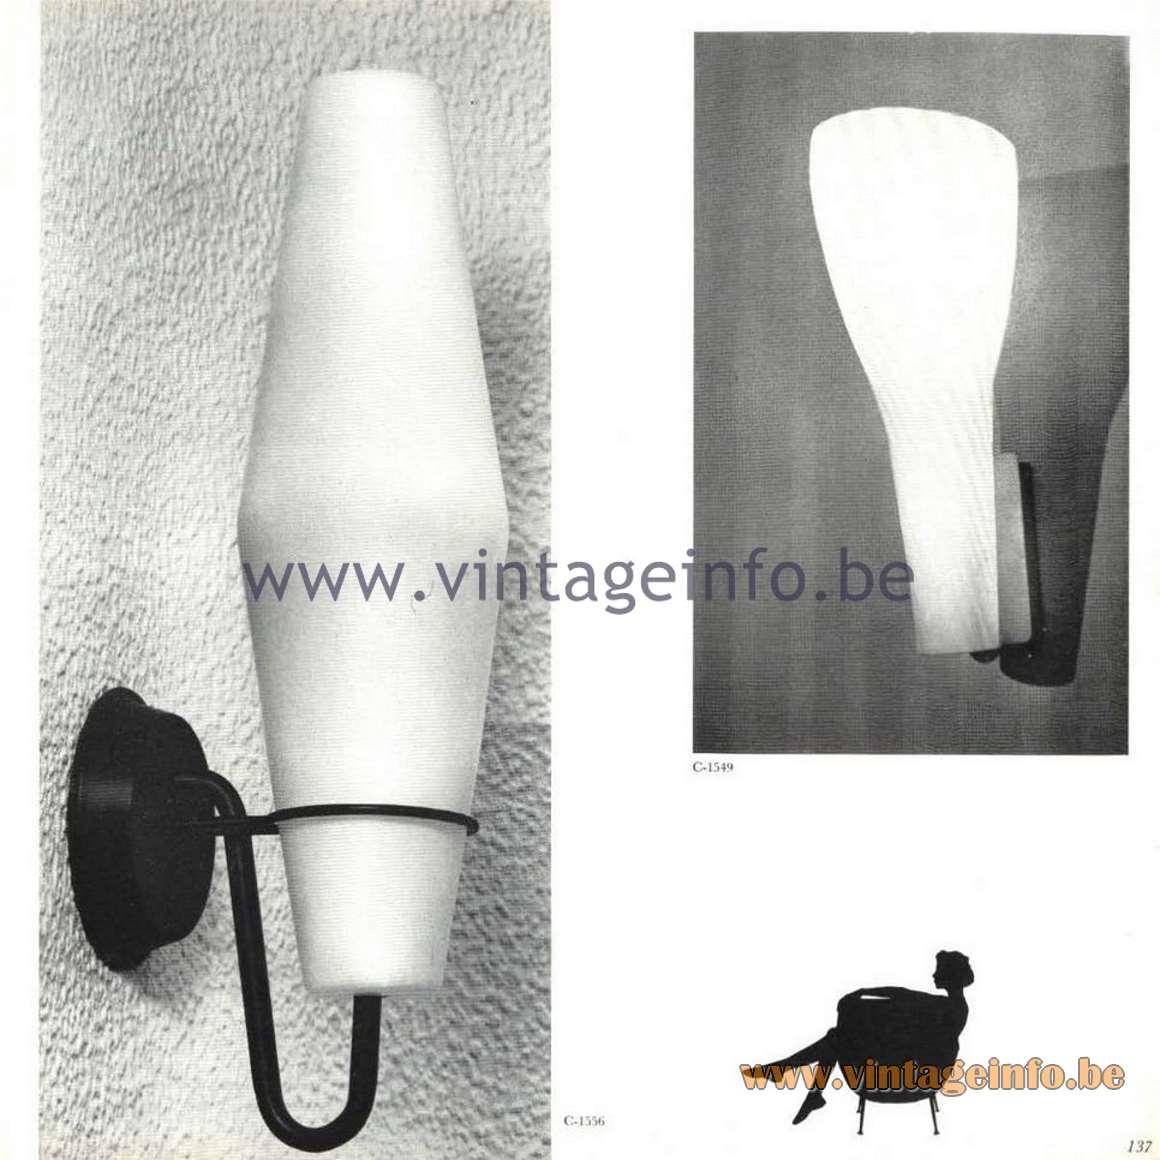 Raak Lantern Pendant Lamp - Catalogues